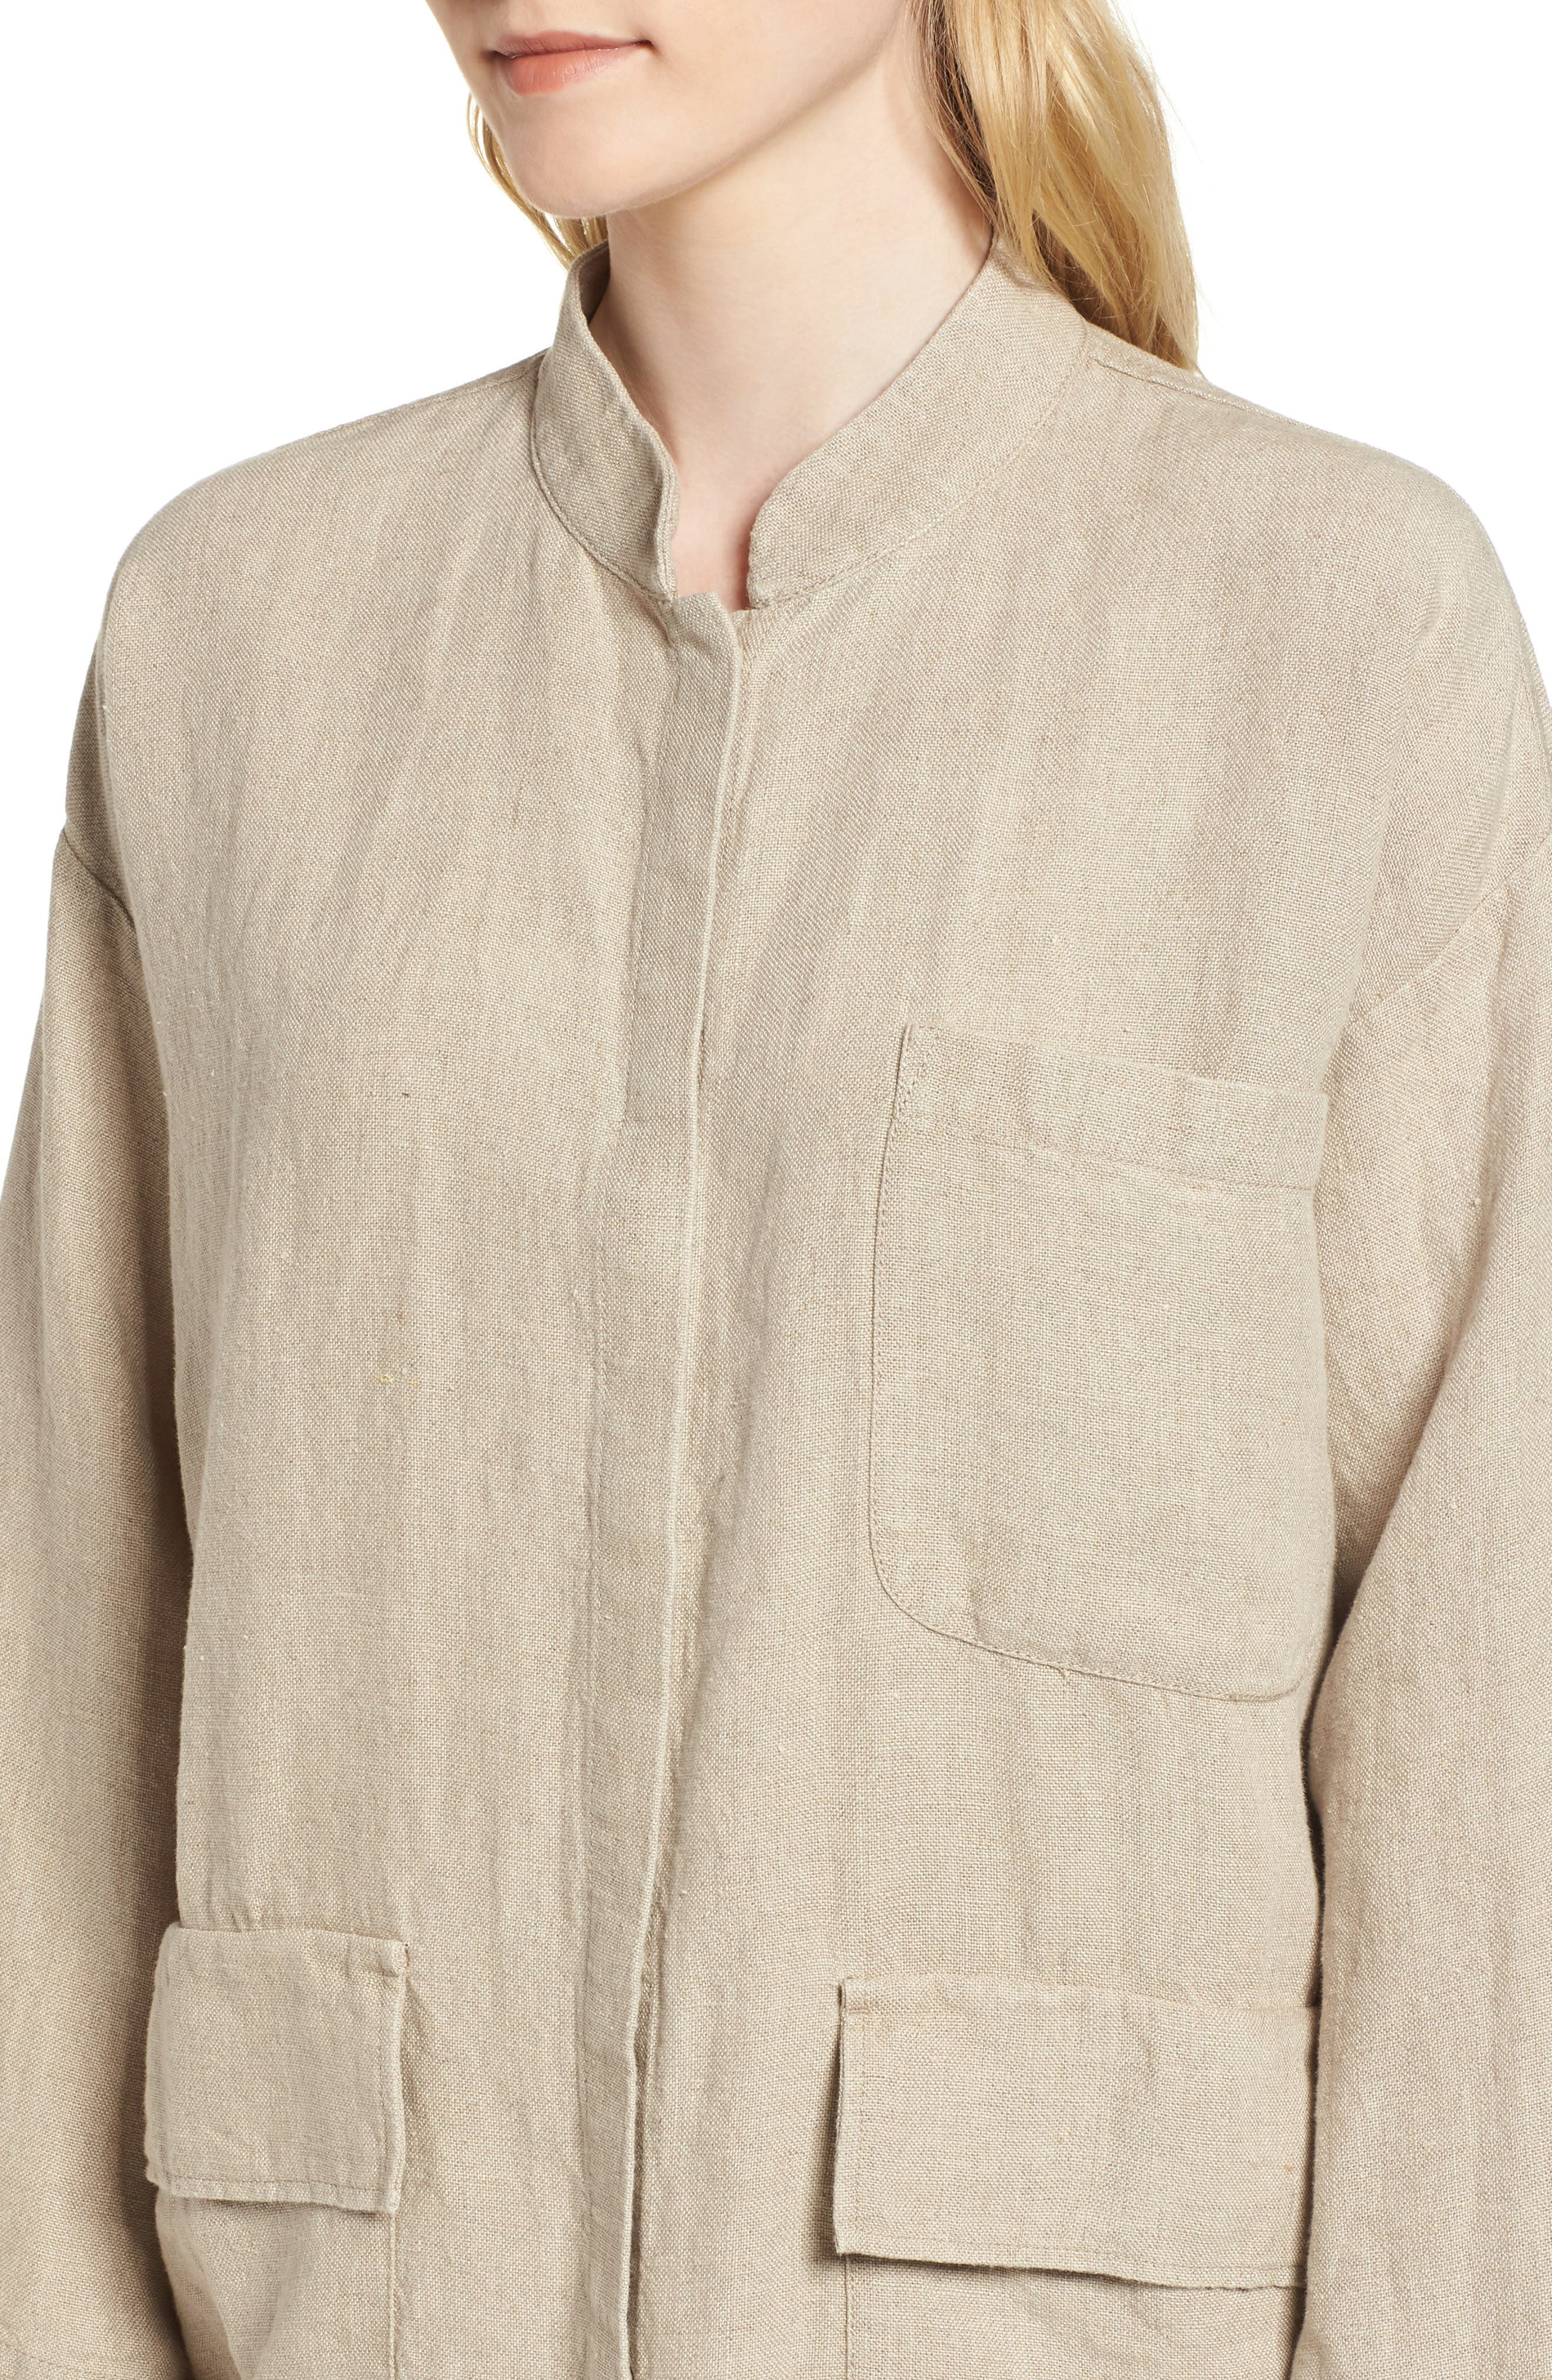 Organic Linen Jacket,                             Alternate thumbnail 4, color,                             Undyed Natural